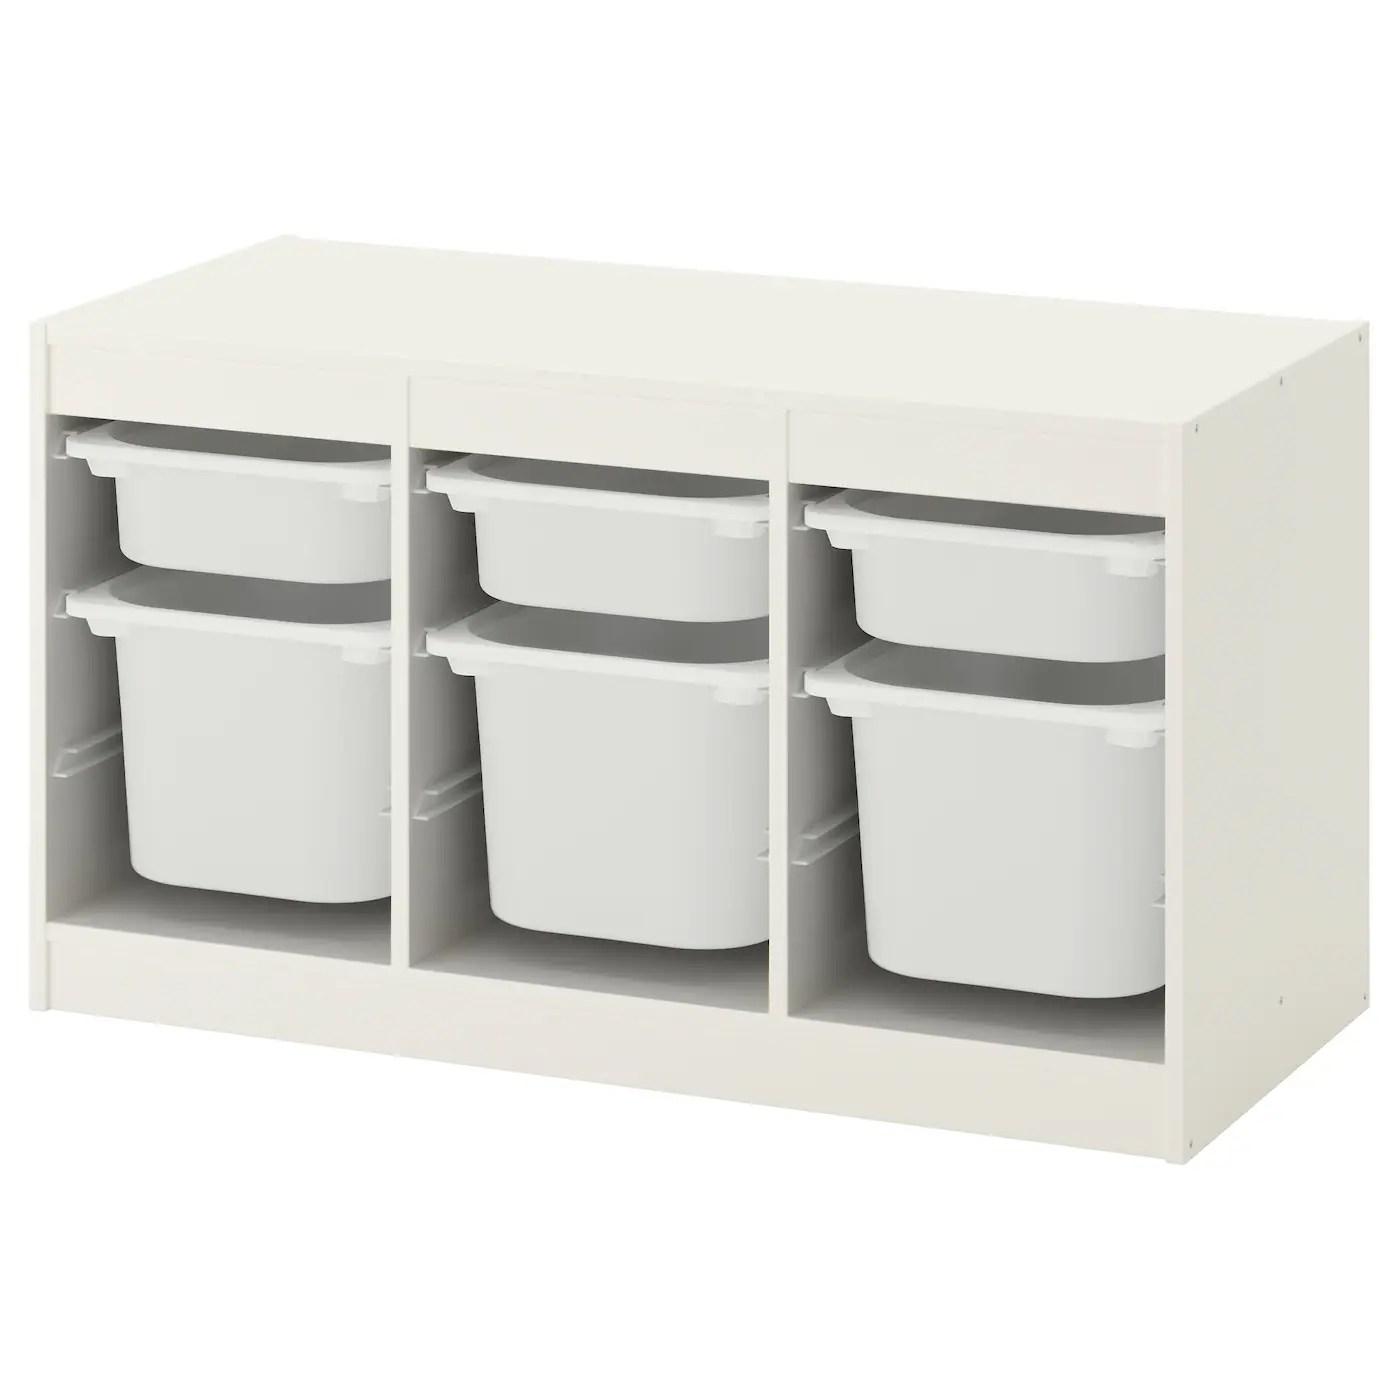 trofast storage combination with boxes white white 99x44x56 cm